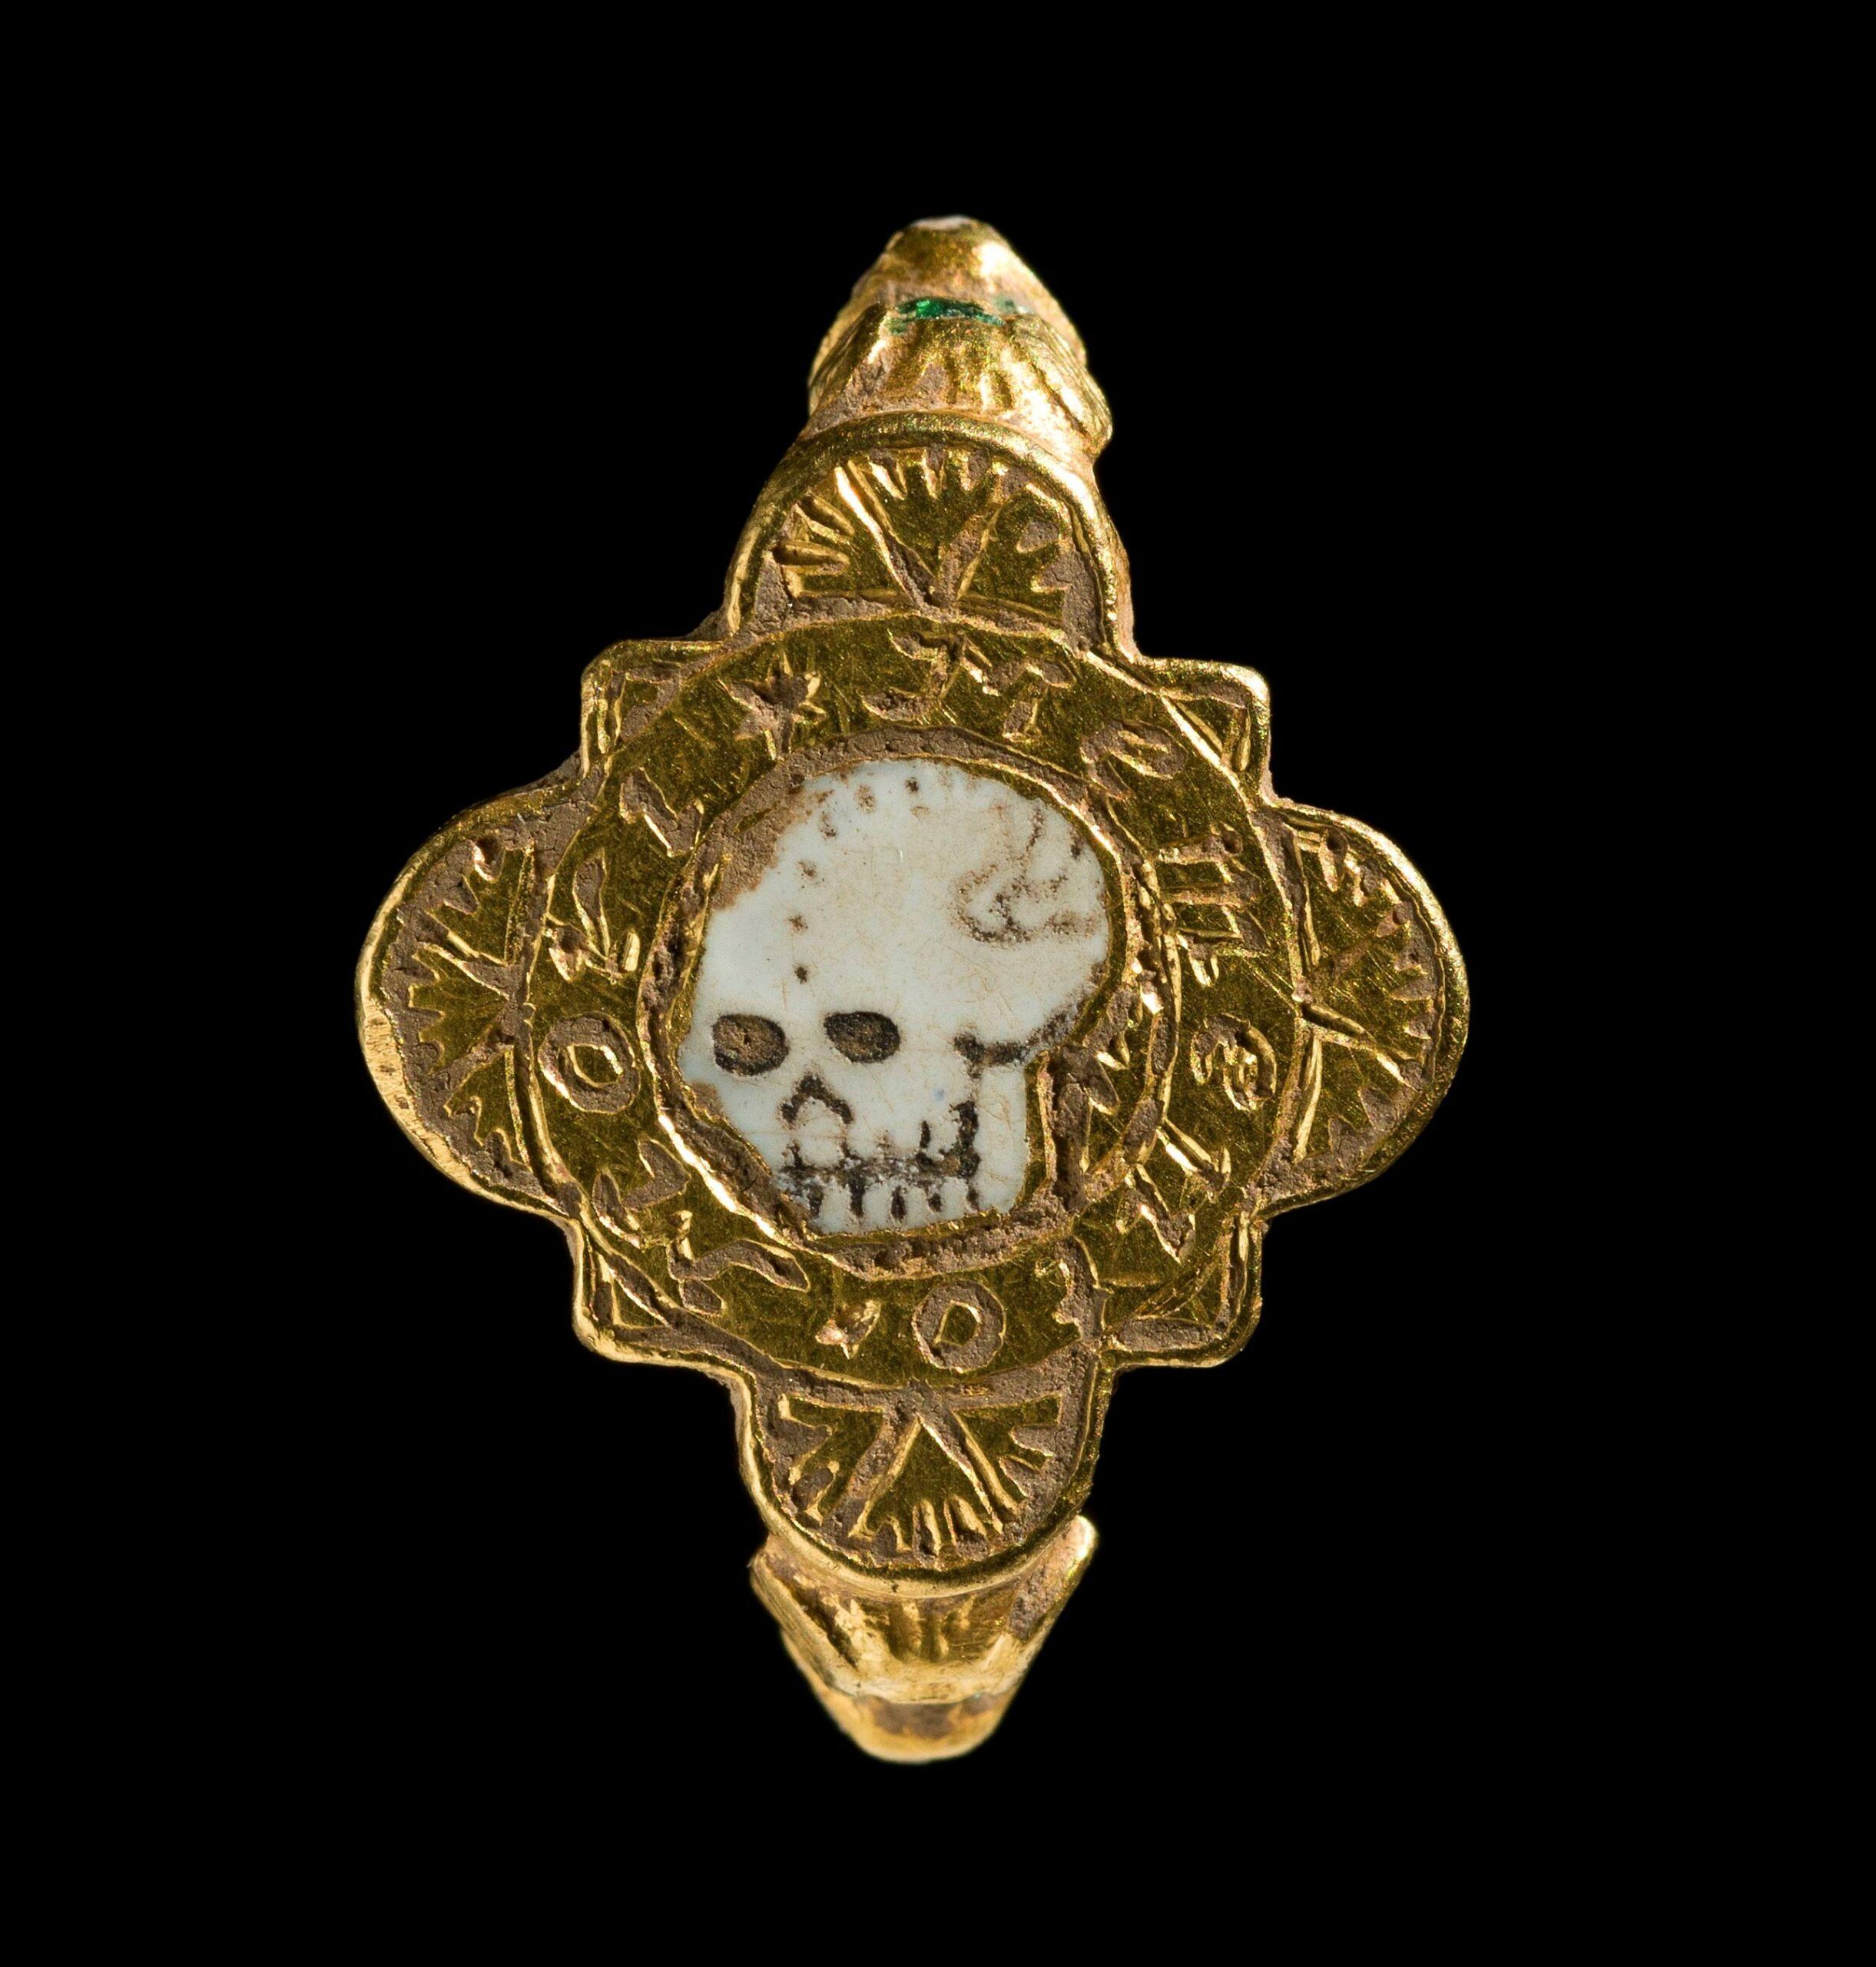 'Memento mori' among Welsh finds declared treasure